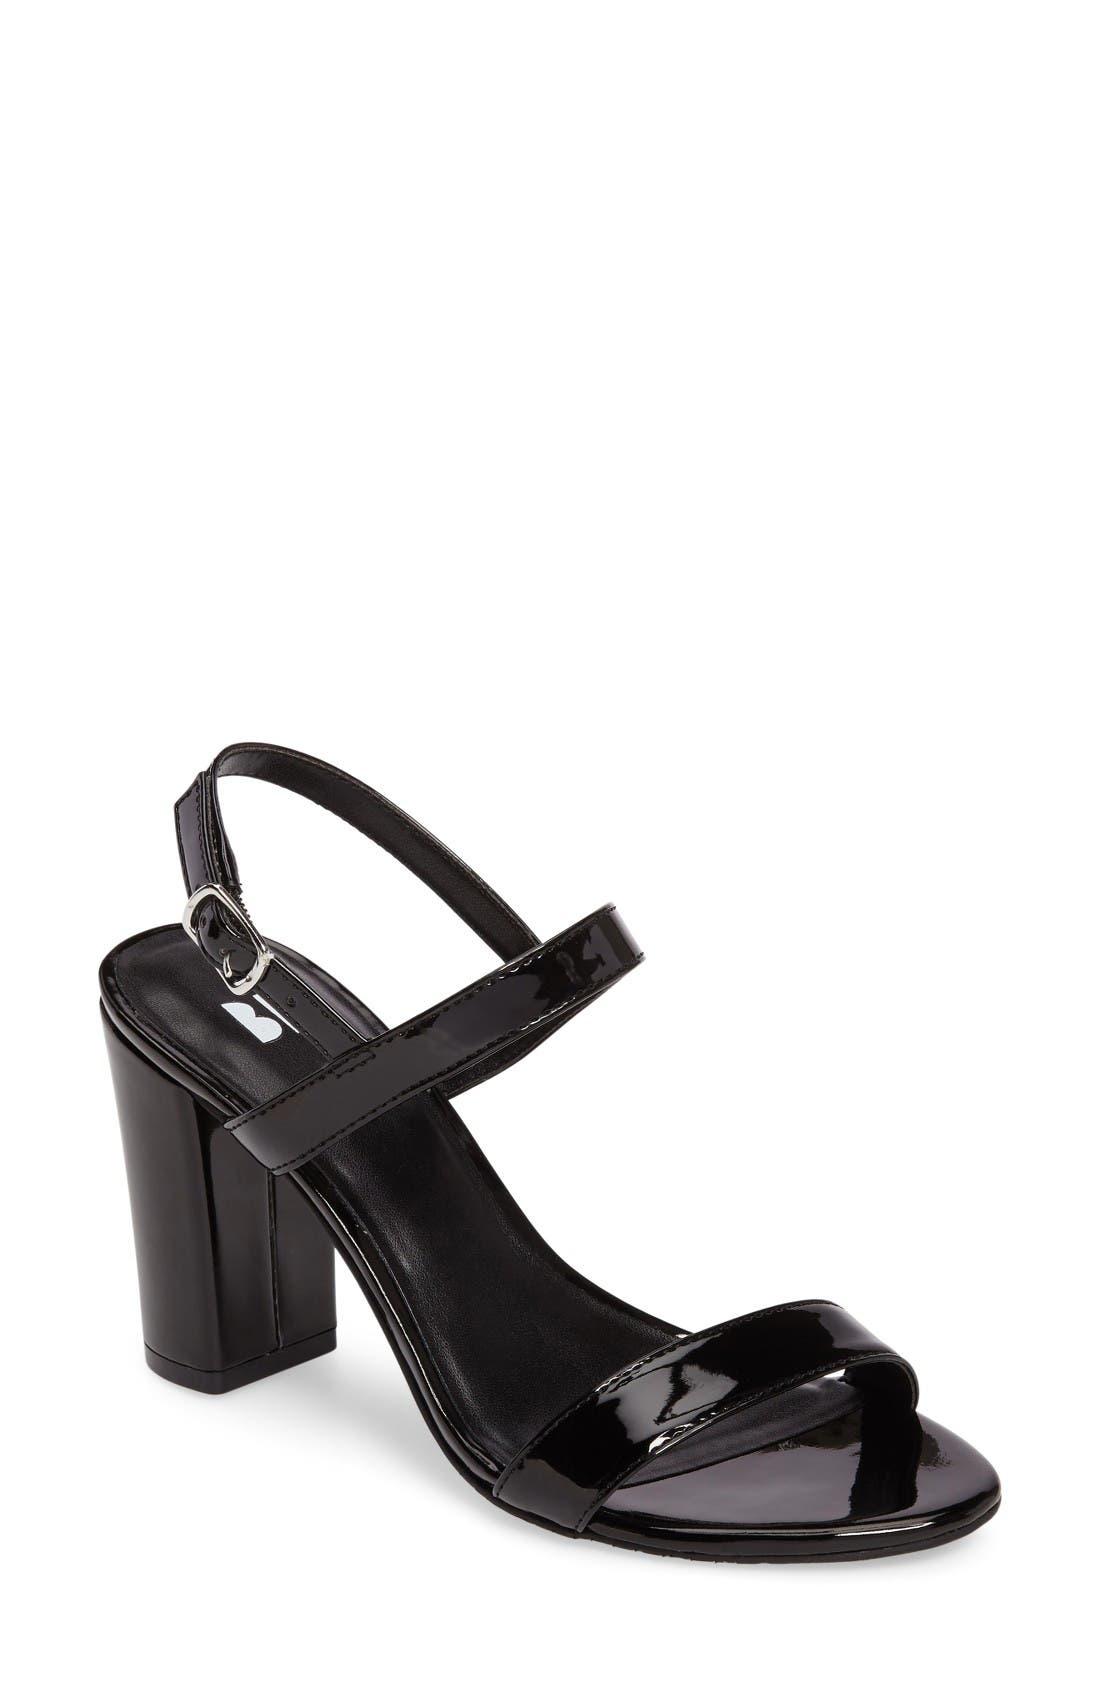 Main Image - BP. Lula Block Heel Slingback Sandal (Women)